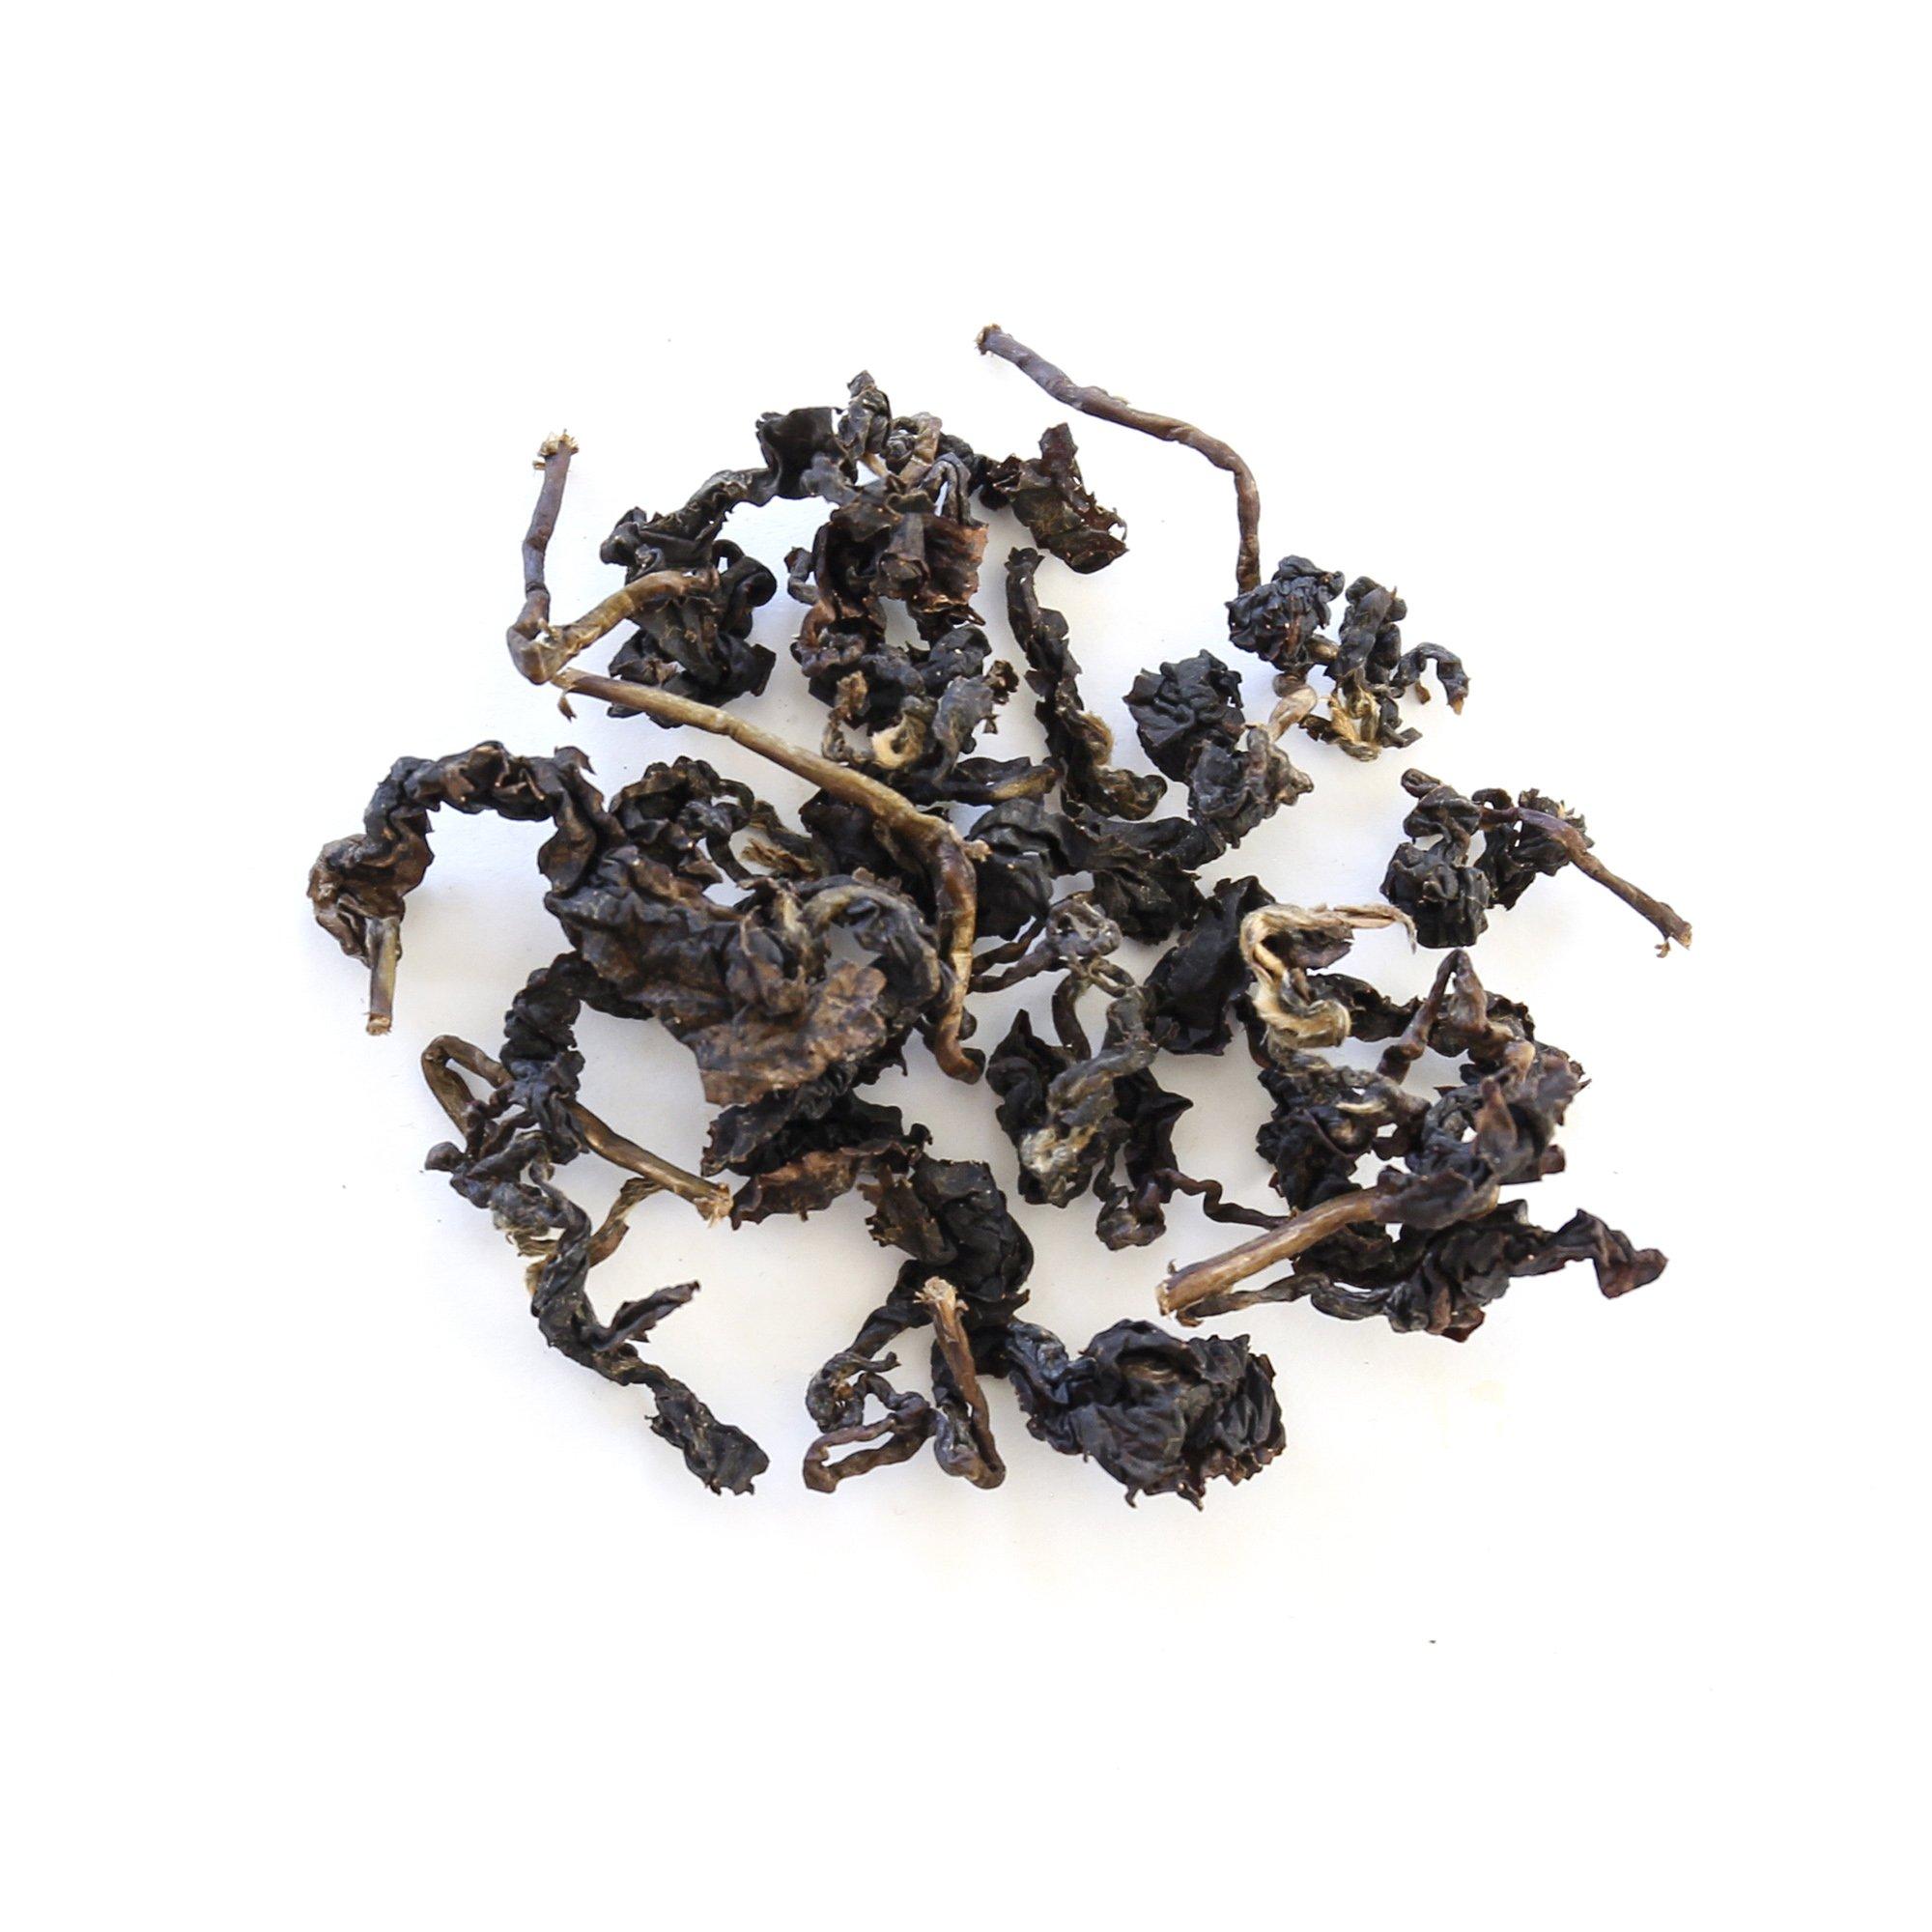 Natural Taiwan High Mountain Sapphire GABA Loose Leaf Oolong Tea, 50g/1.76 oz by TEAMALCHI (Image #4)